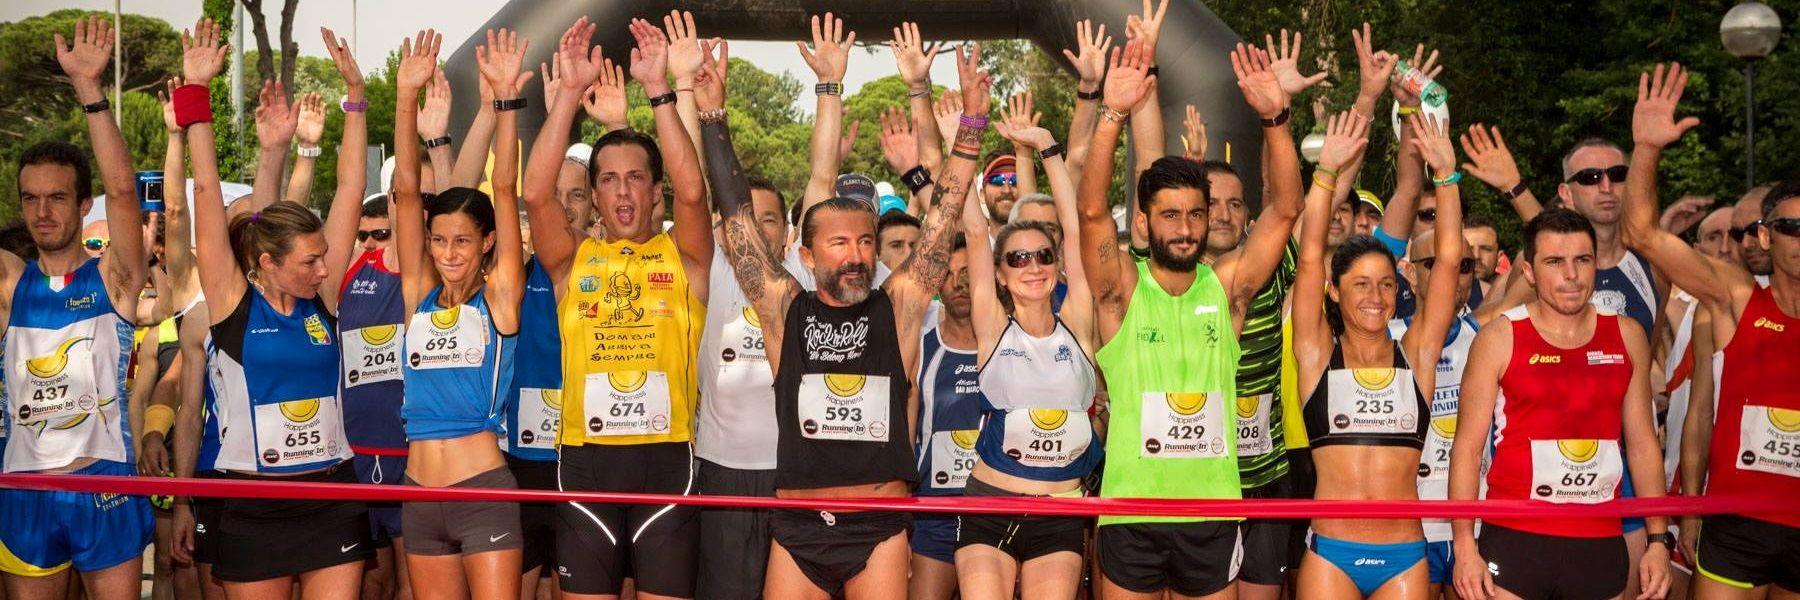 Running in Milano Marittima